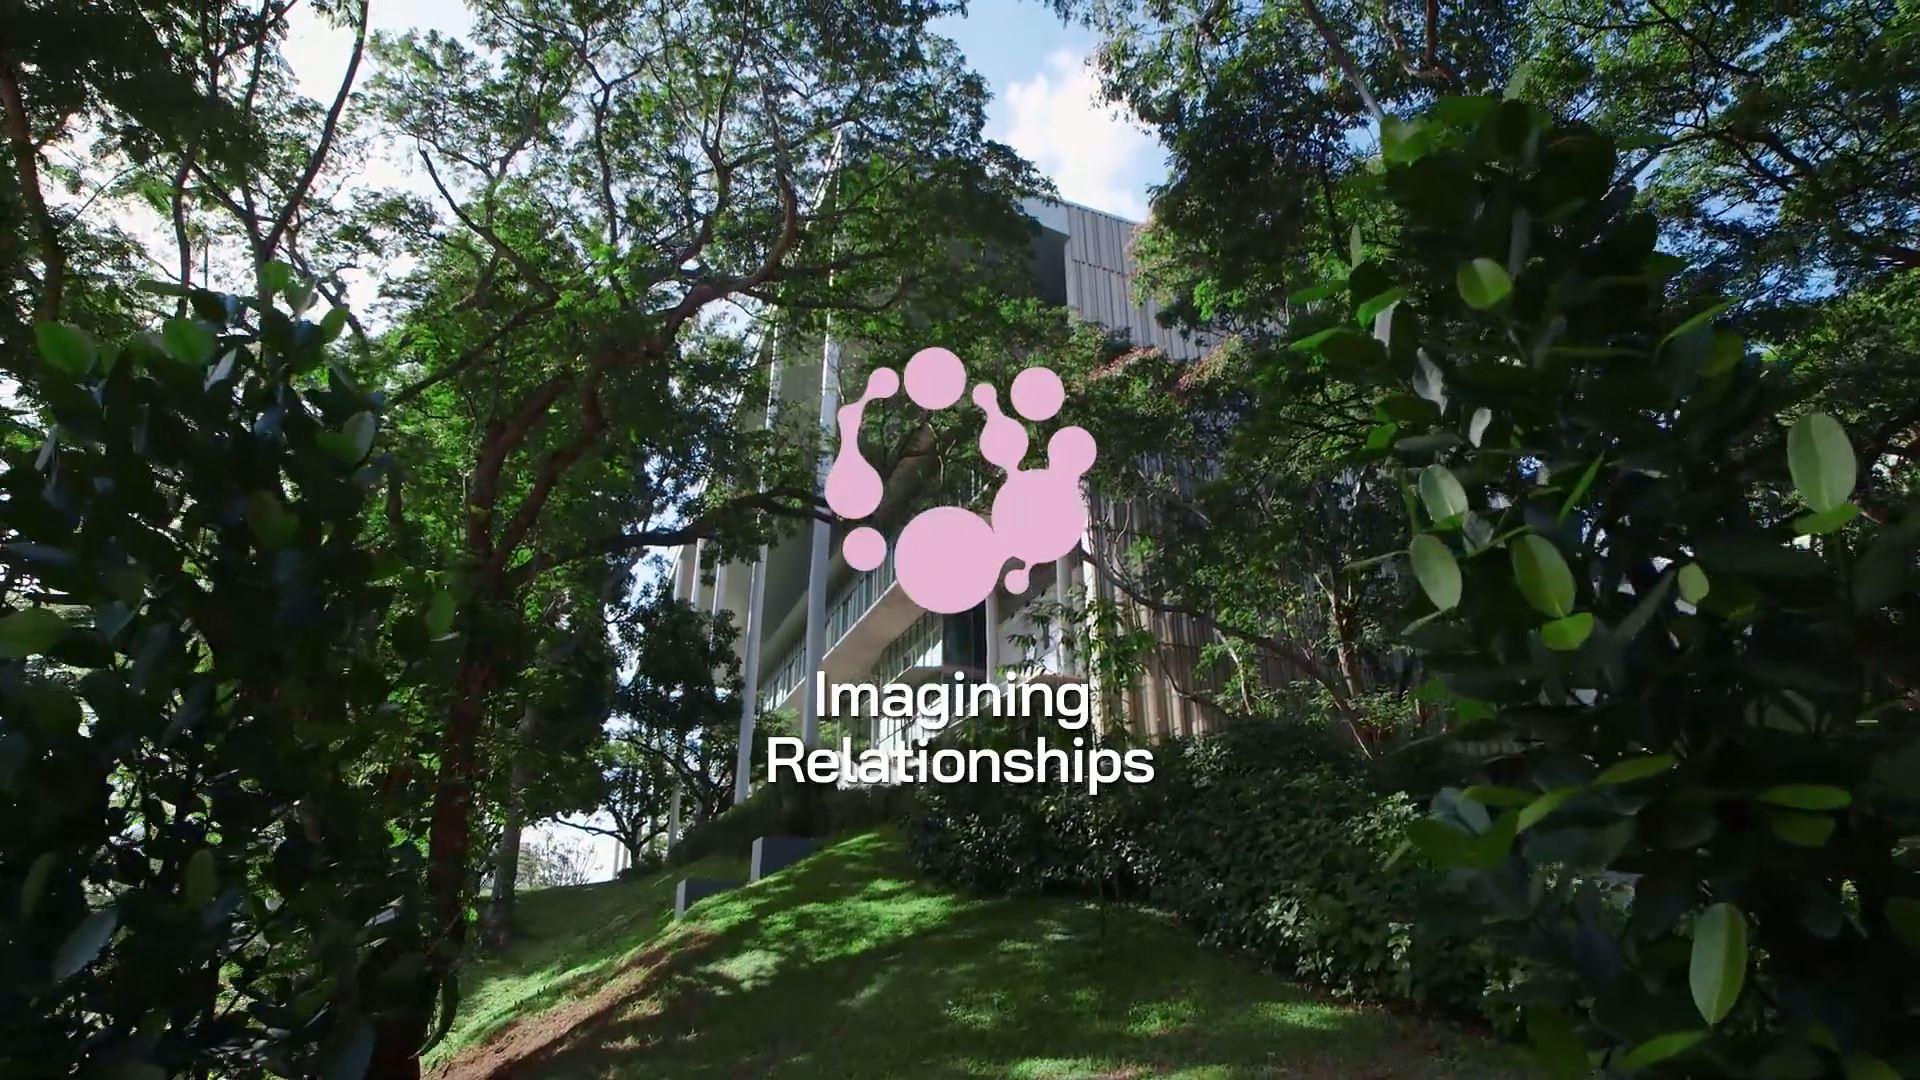 Imagining Relationships